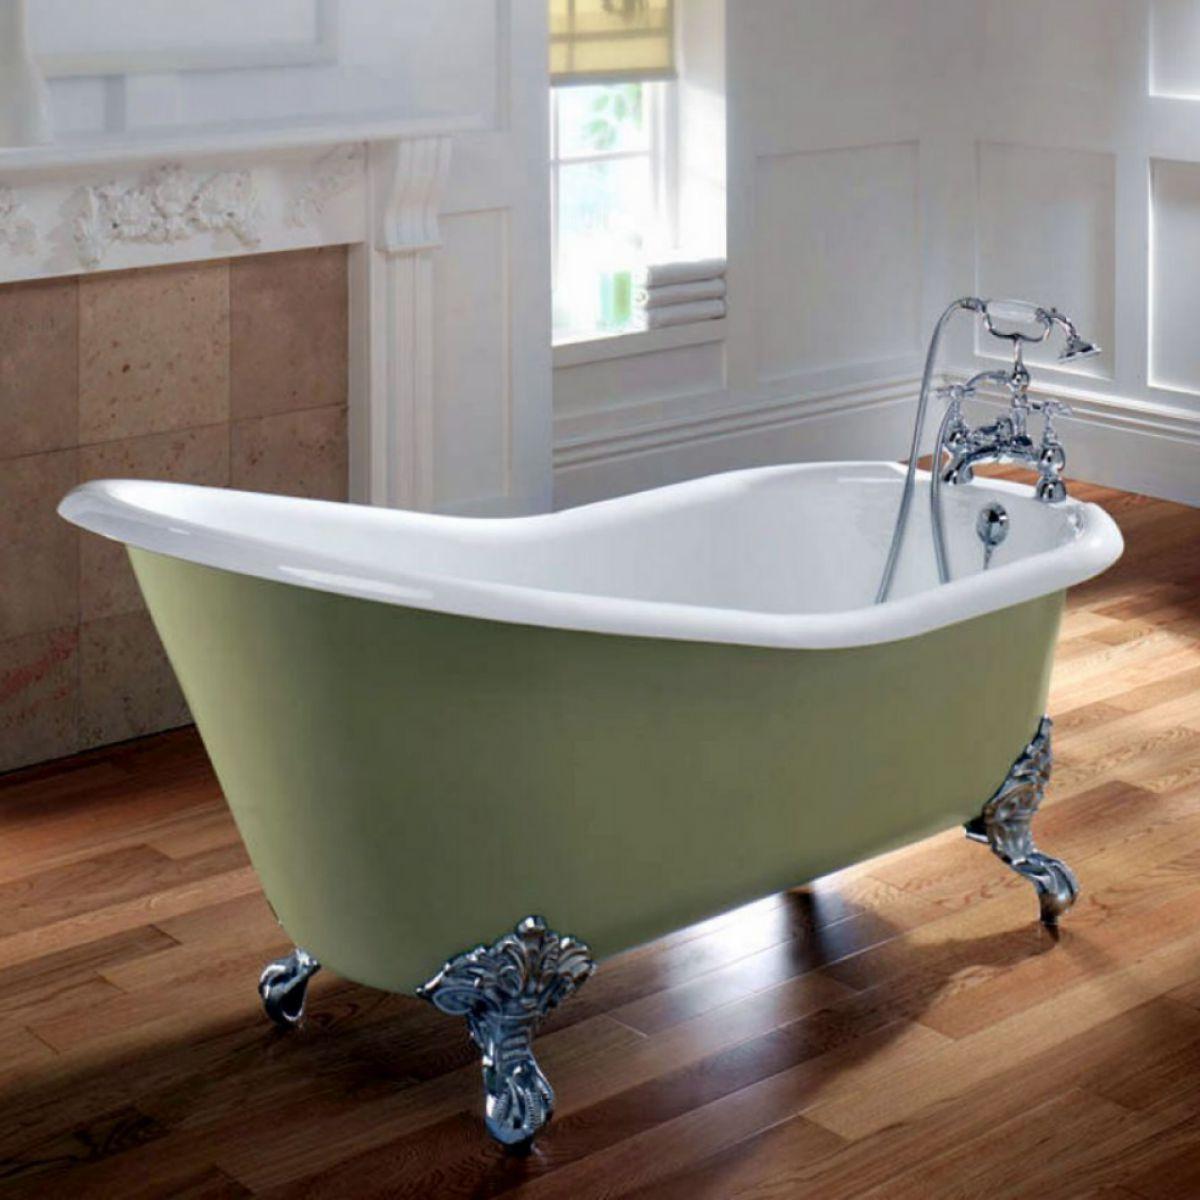 Imperial ritz cast iron slipper bath uk bathrooms for Bath 1200